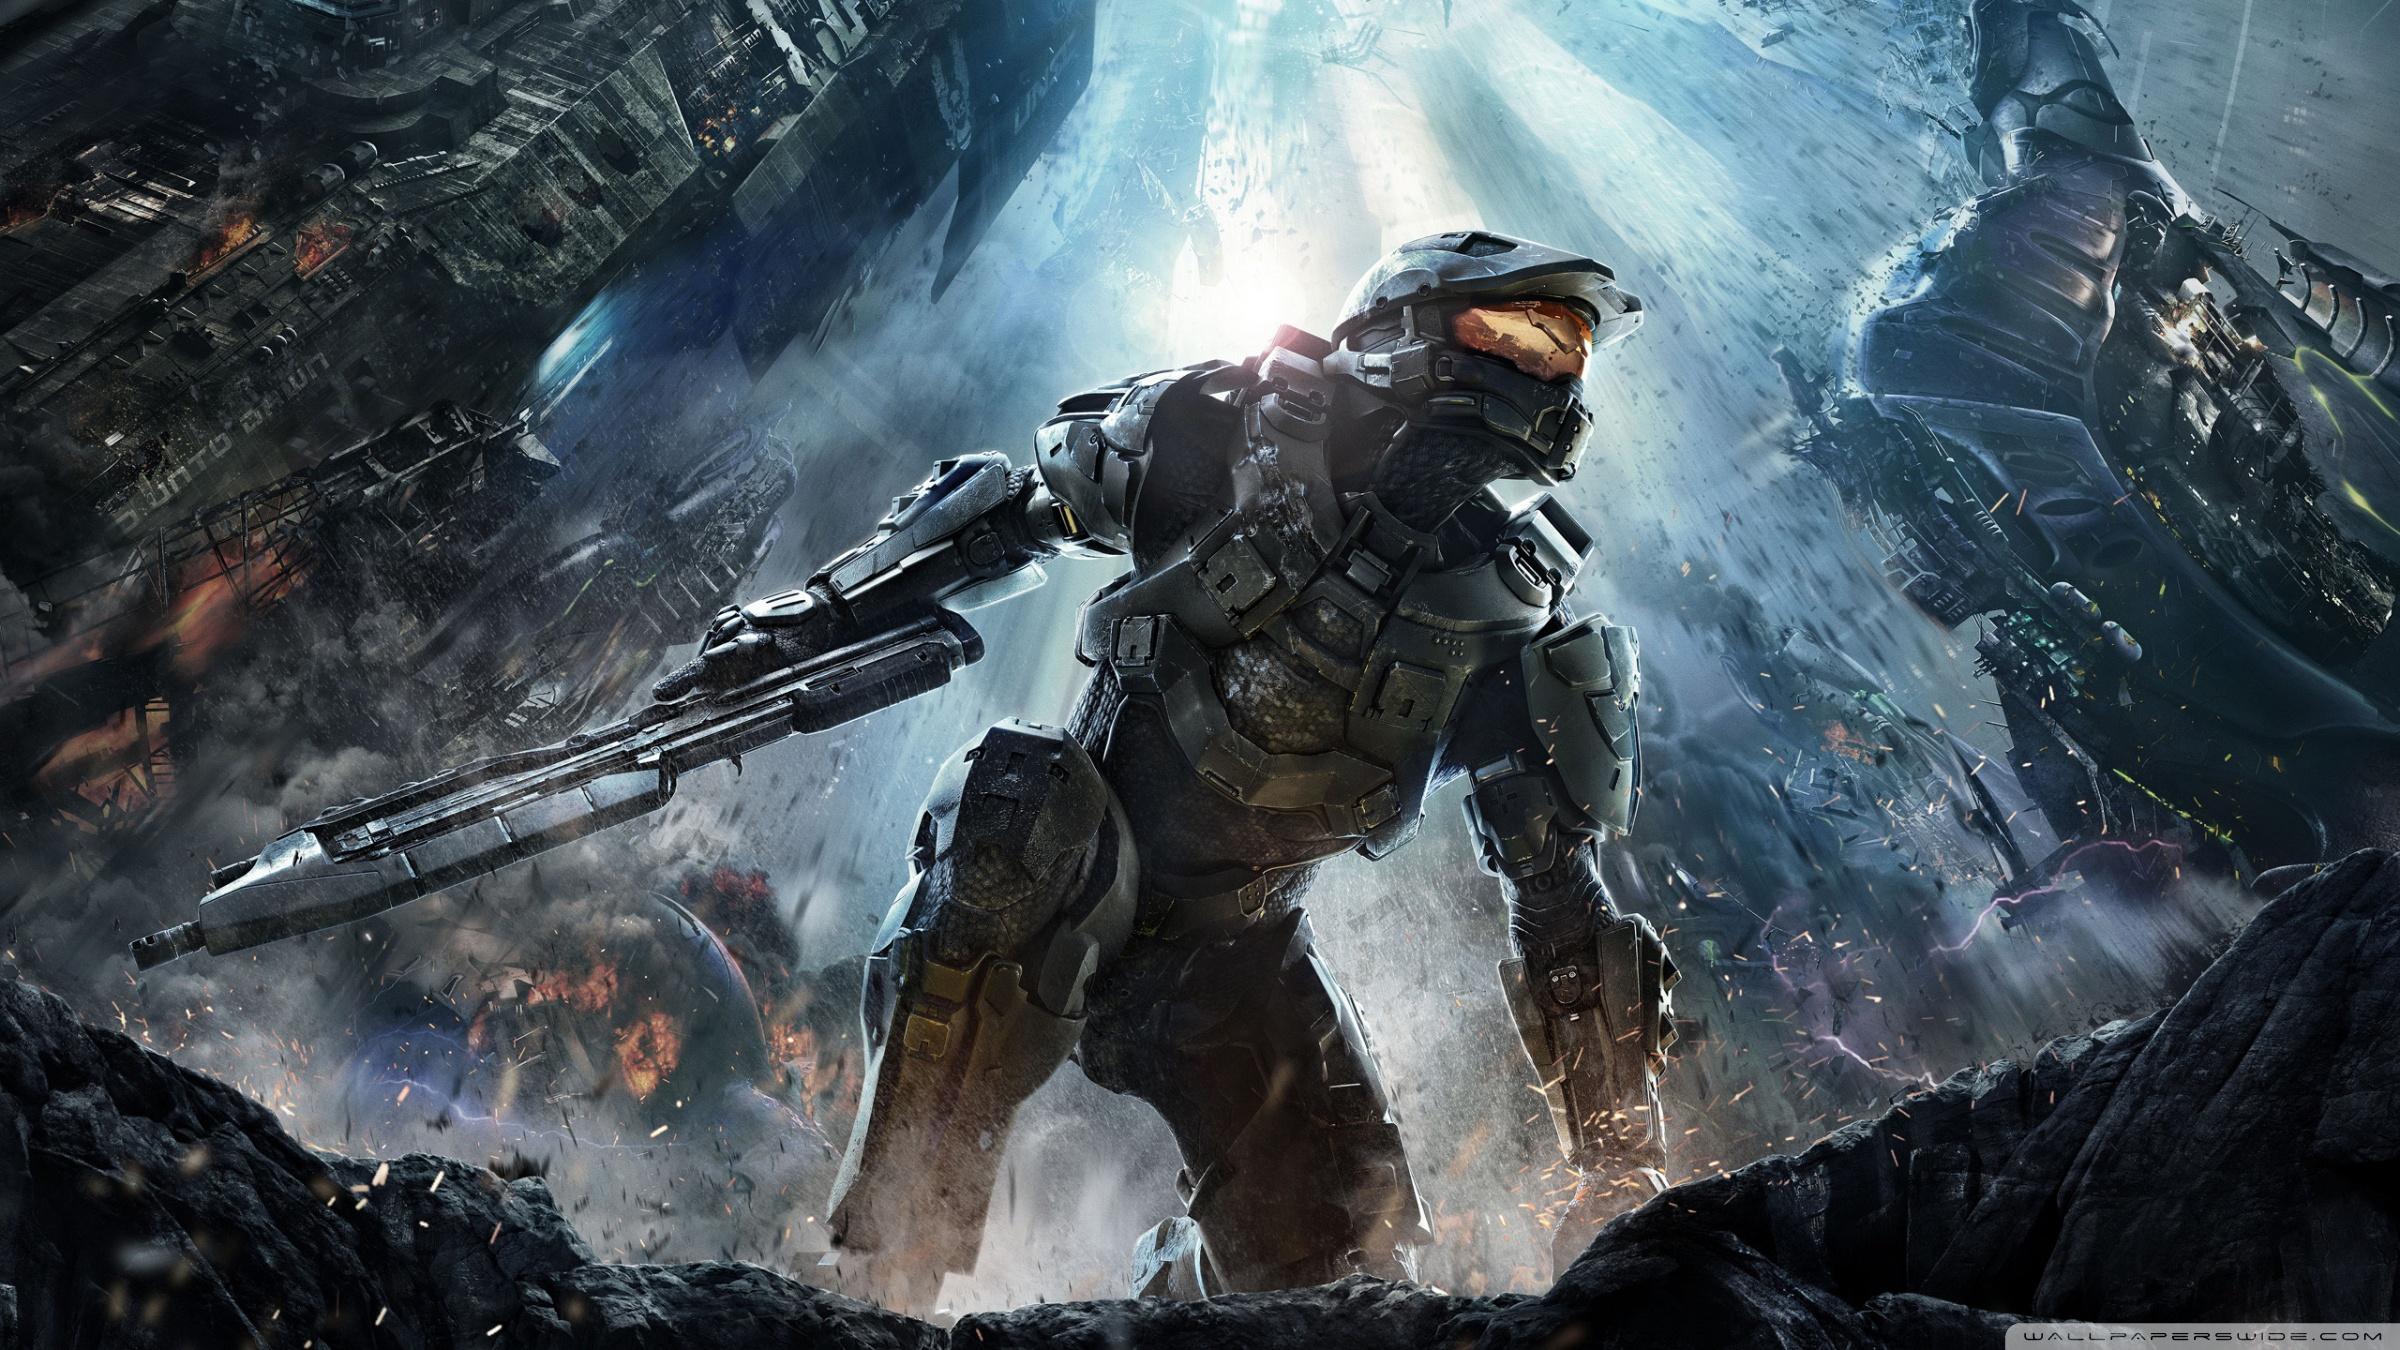 Halo 4 (2012) HD desktop wallpaper : High Definition : Fullscreen